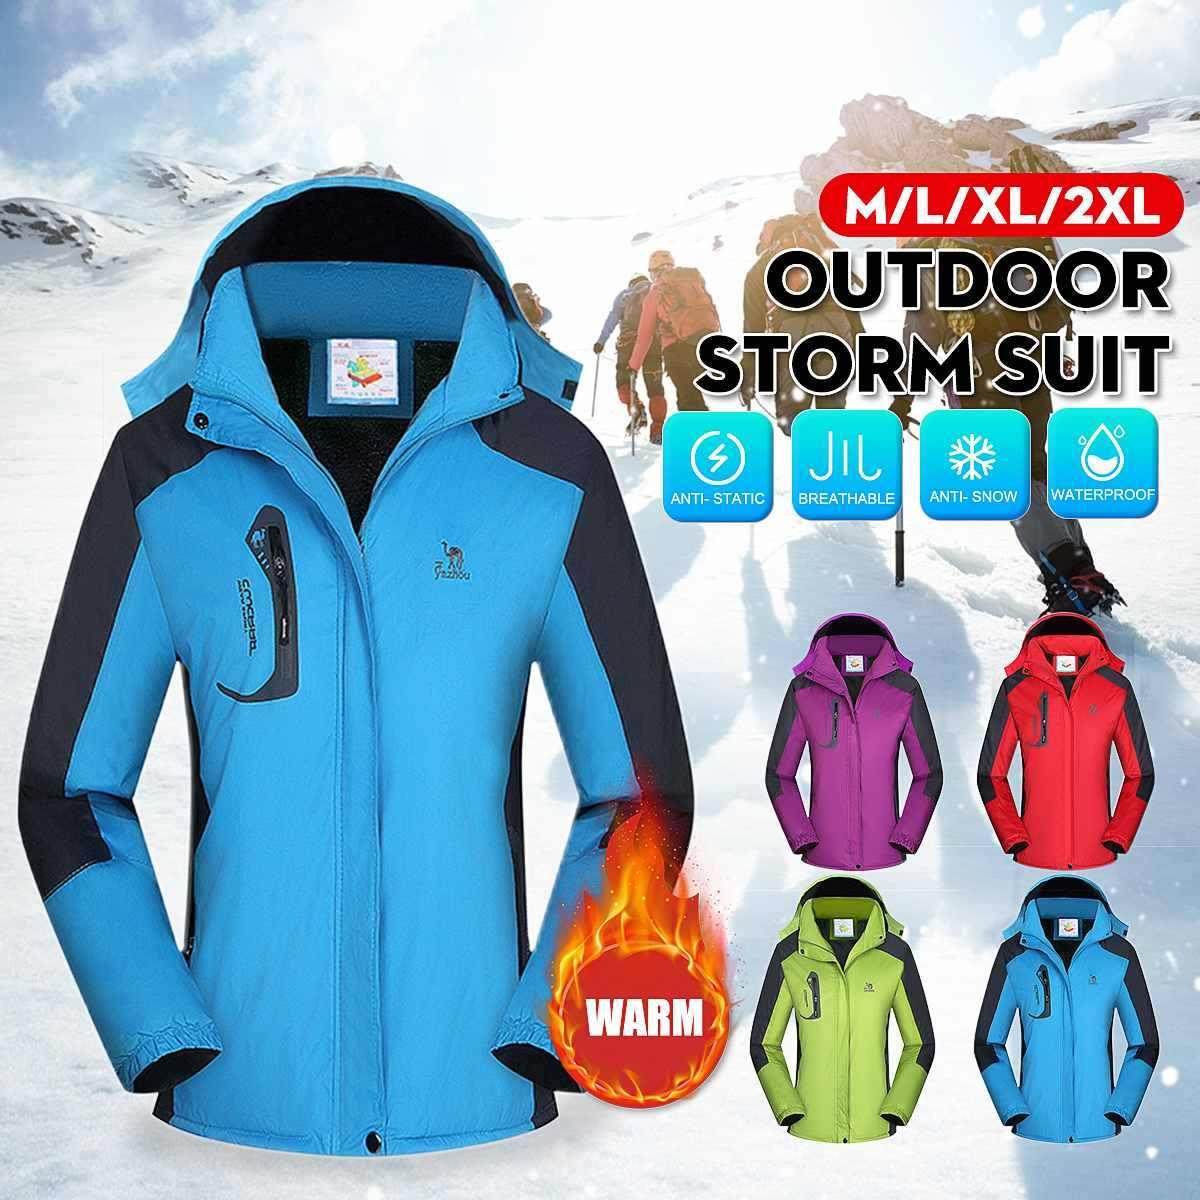 Tahan Air Ski Jaket Bulu Berjajar Salju Mantel Outdoor Hiking Snowboard Windproof Snowboard Bulu Jaket Musim Dingin Salju Pria